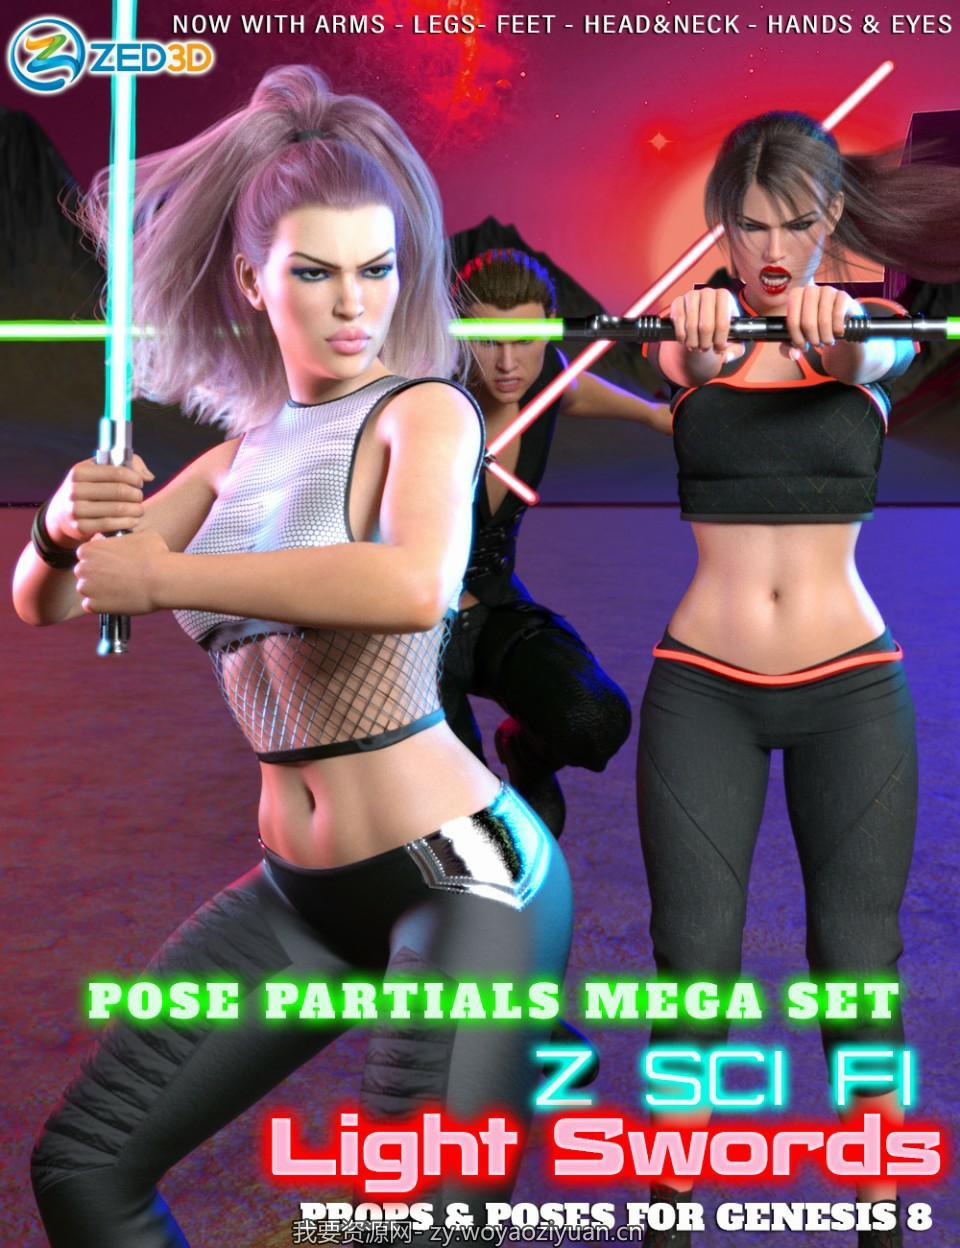 Z Sci Fi Light Swords Mega Set